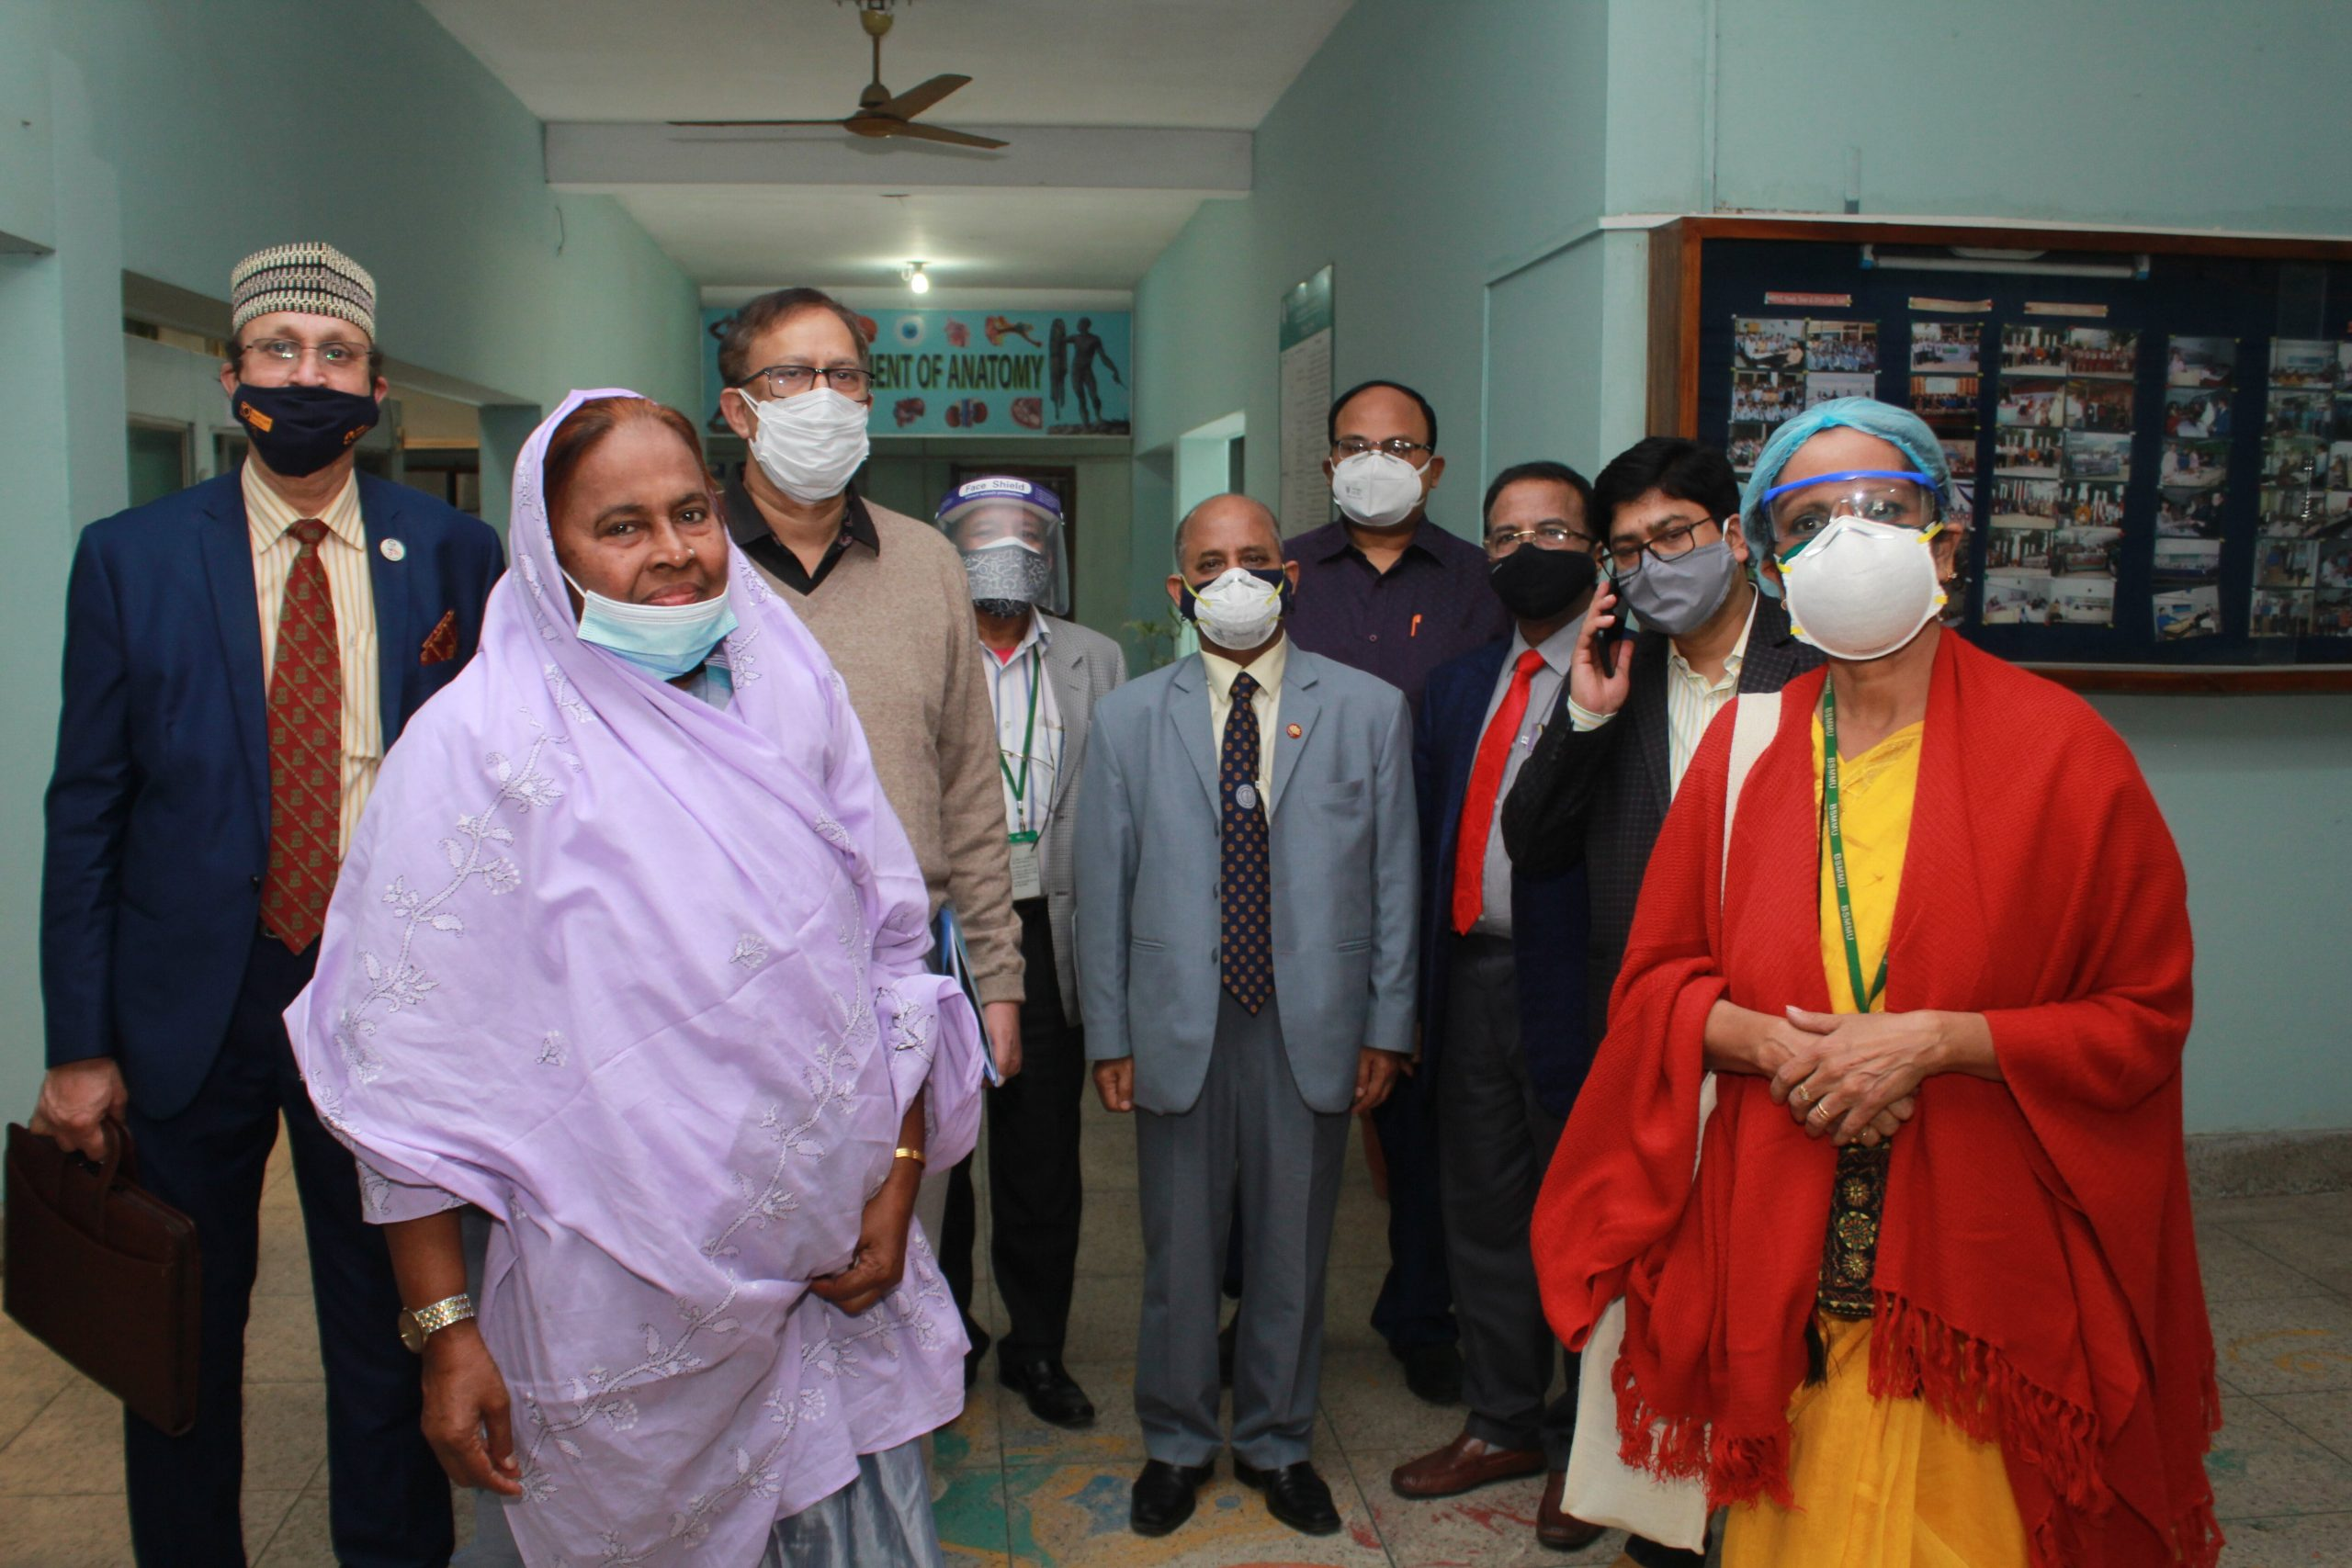 Inspection for Post Graduation Course Affiliation for Bangabandhu Sheikh Mujib Medical University (BSMMU)